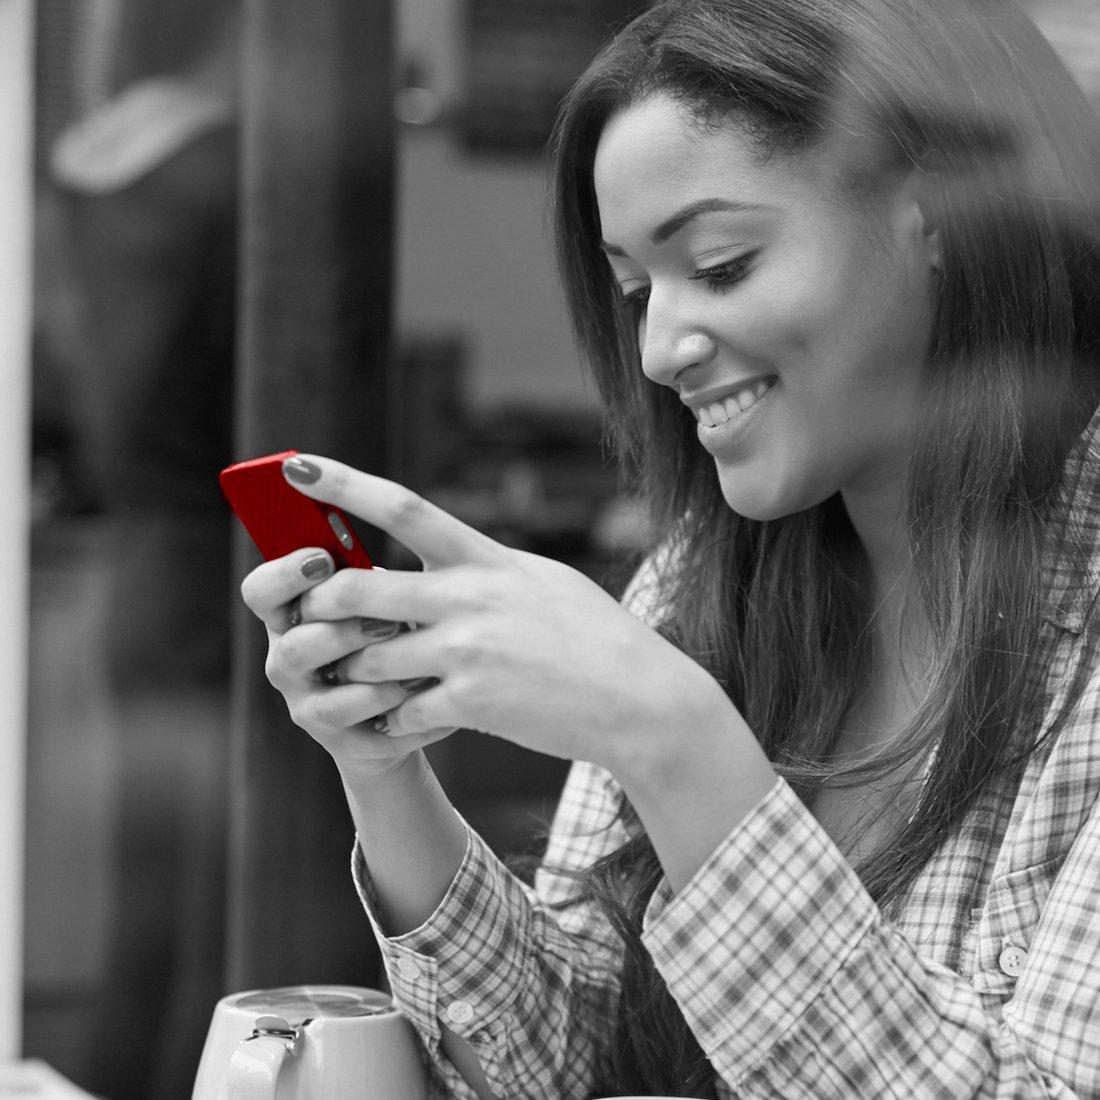 Woman on phone greyscale 1100x1100